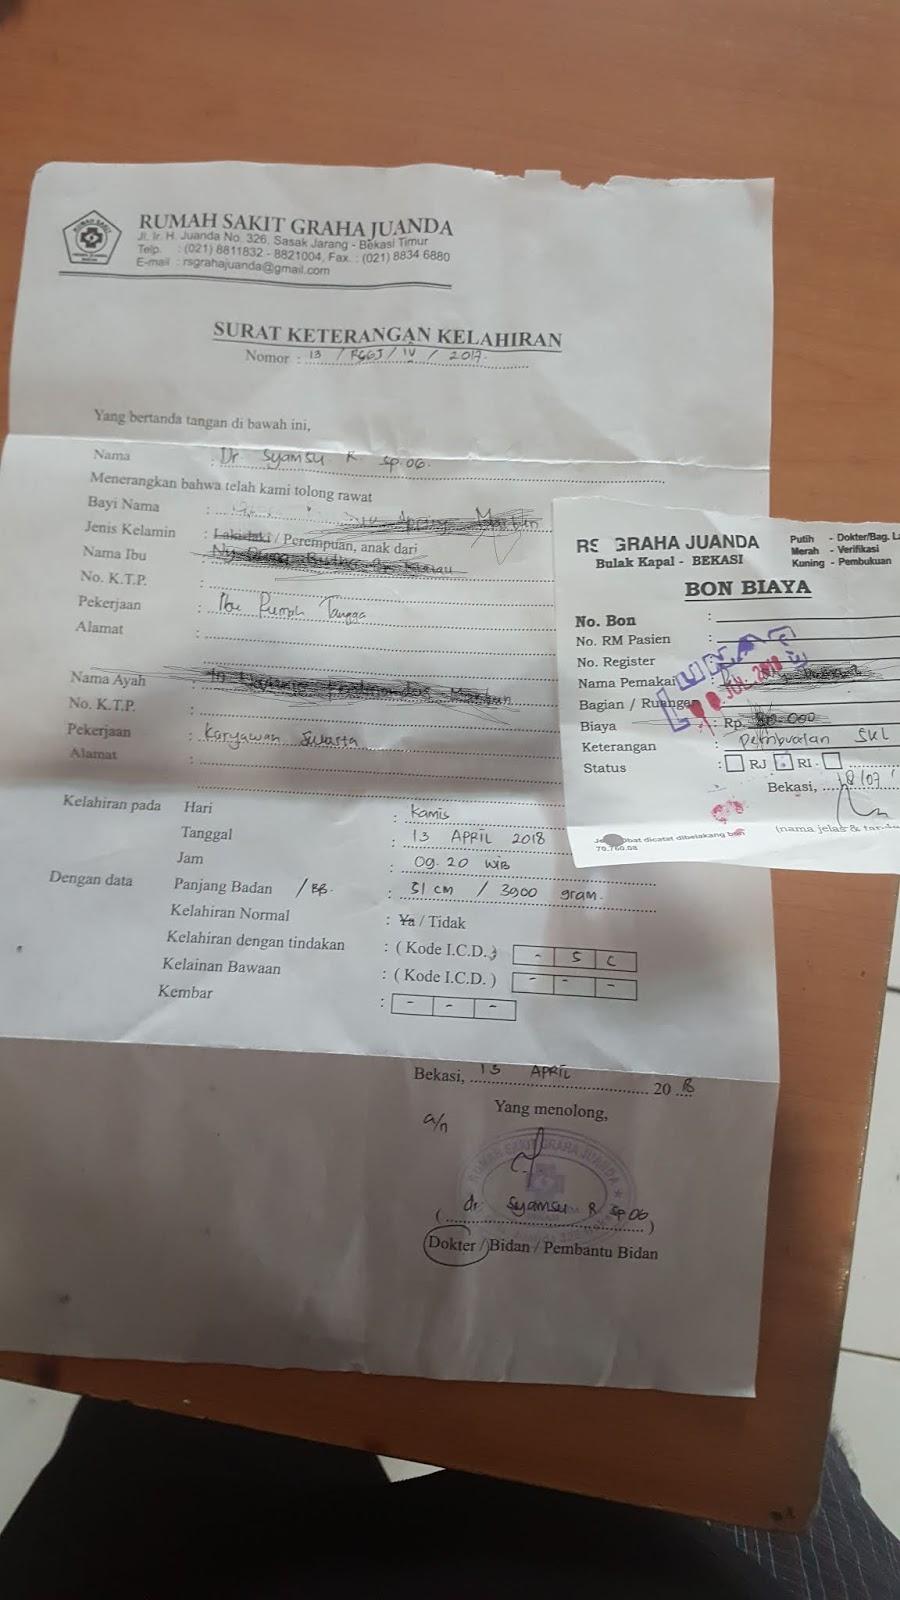 Rumah Sakit Graha Juanda Menjual Selembar Kertas Keterangan